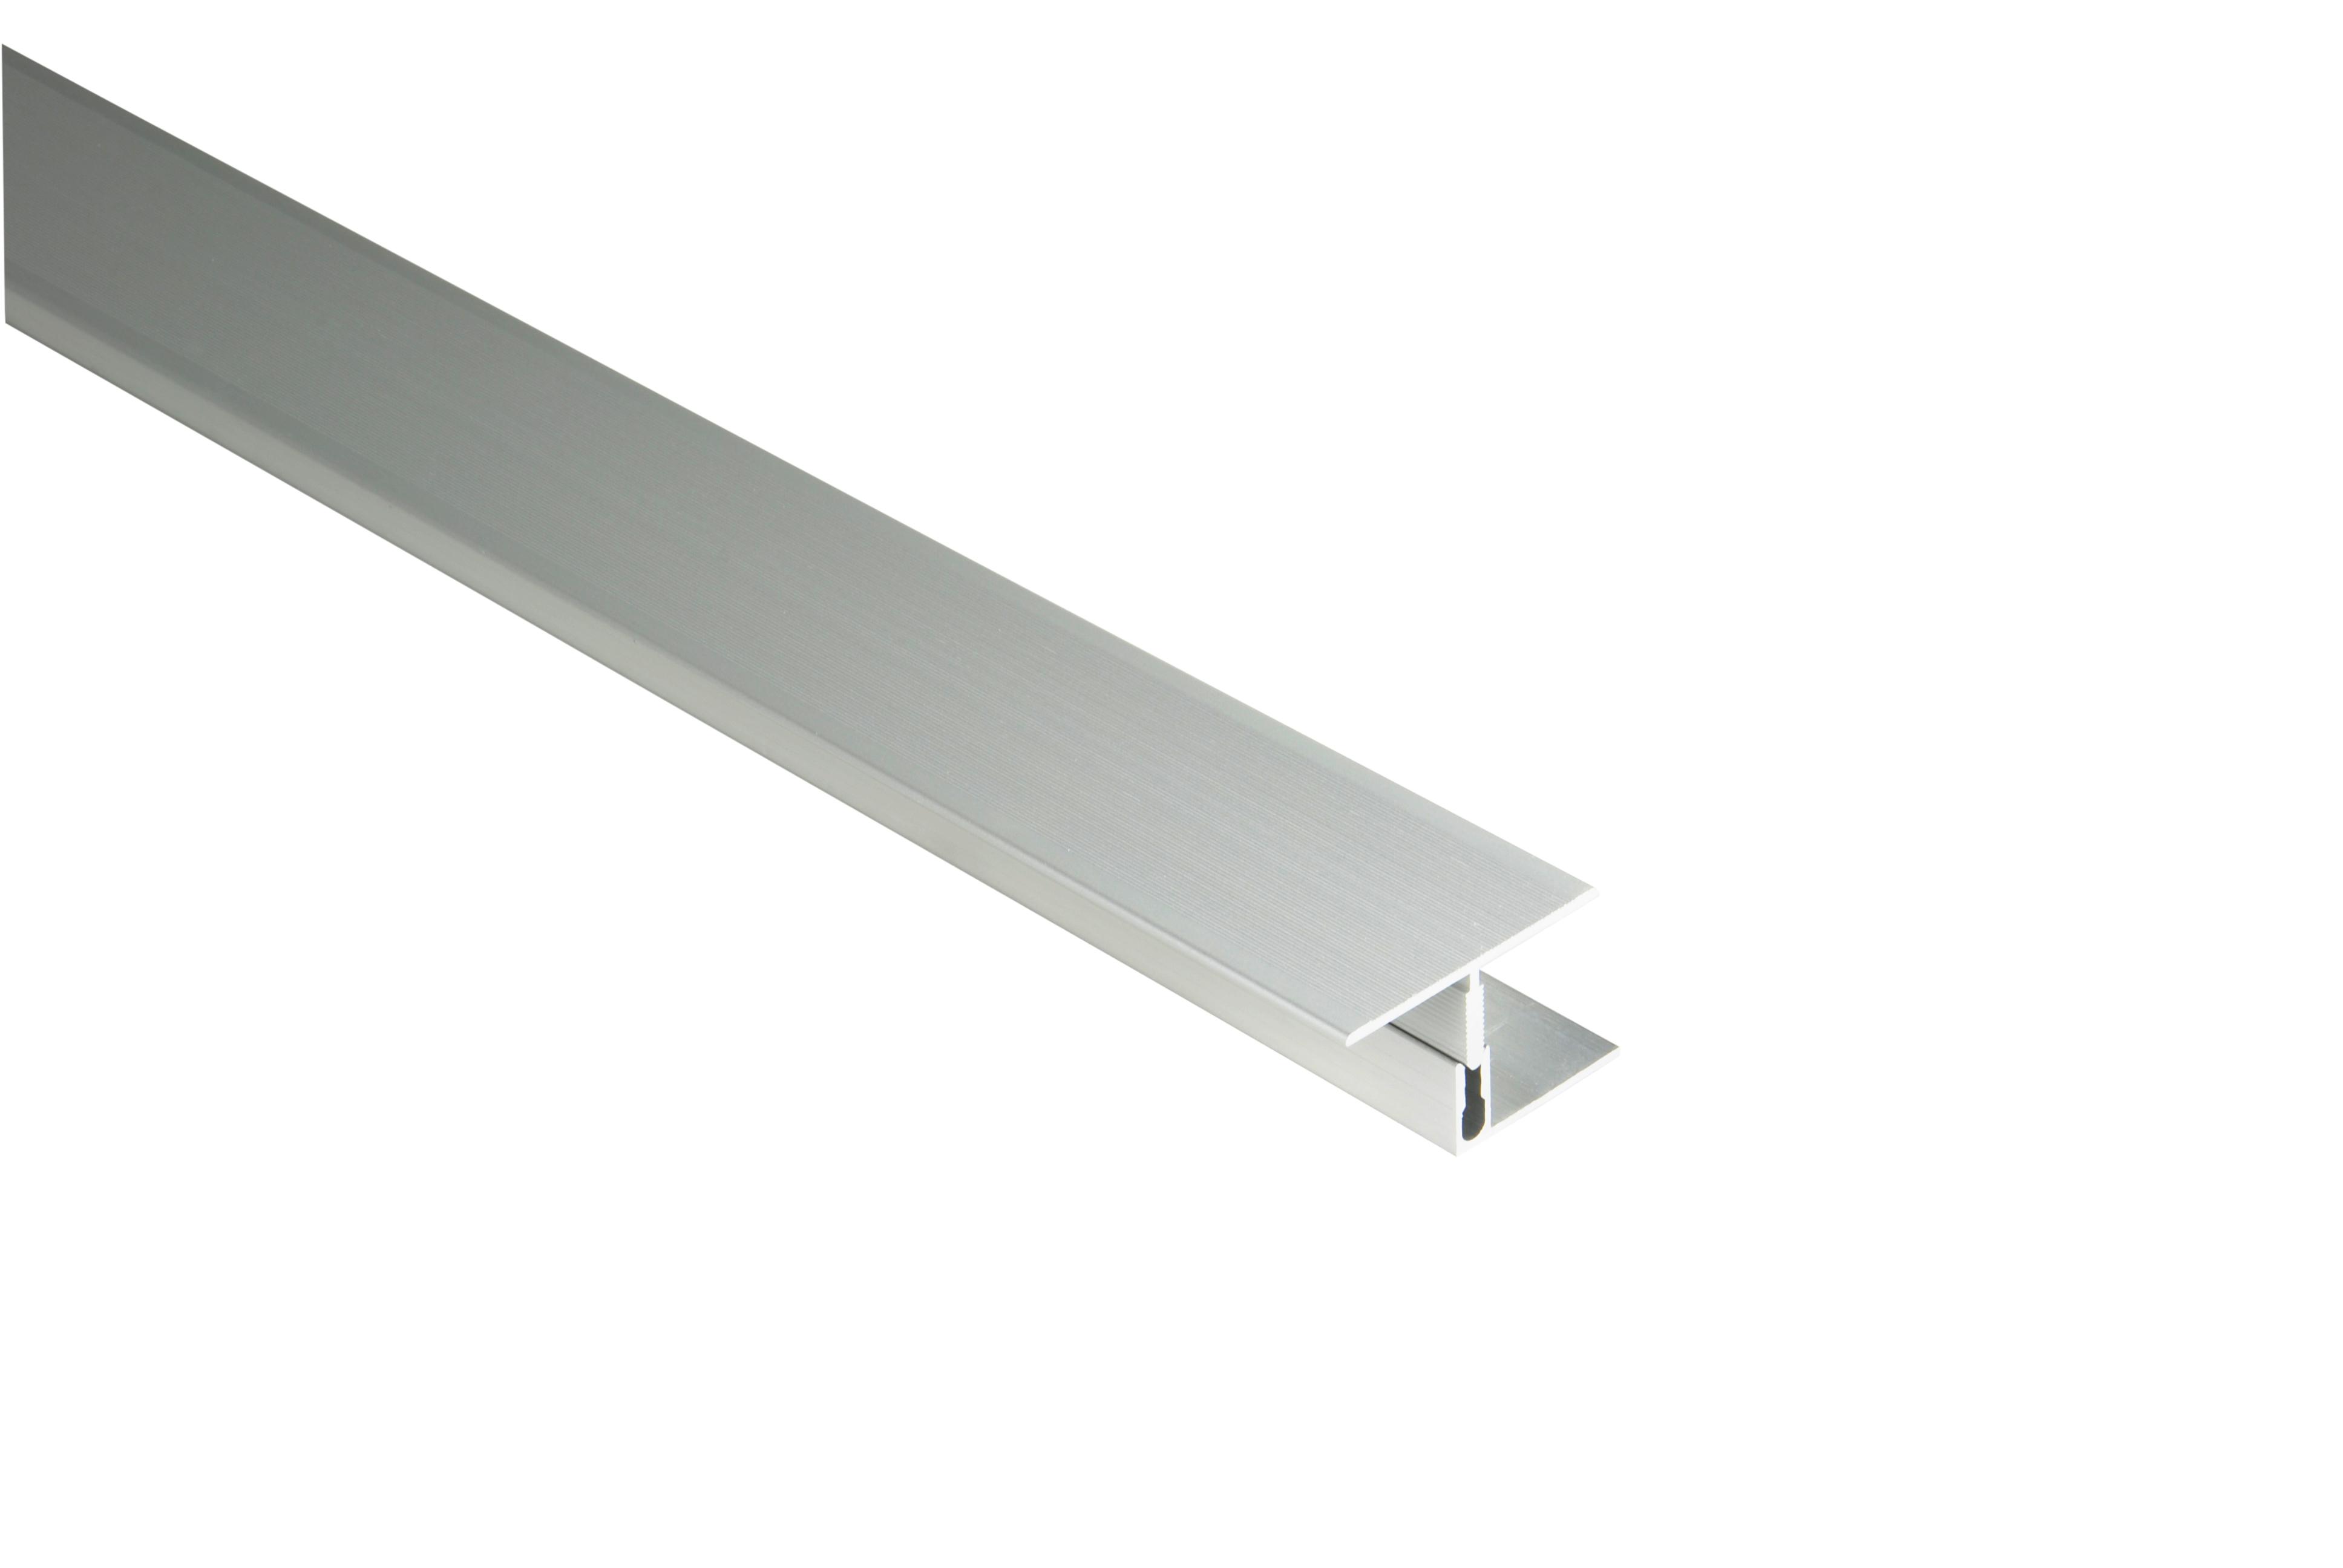 Kovalex Aluminium Übergangsprofil mit Befestigungsprofil - Farbe: Alu-Silber - Abmessung: 60x23x2.500 mm